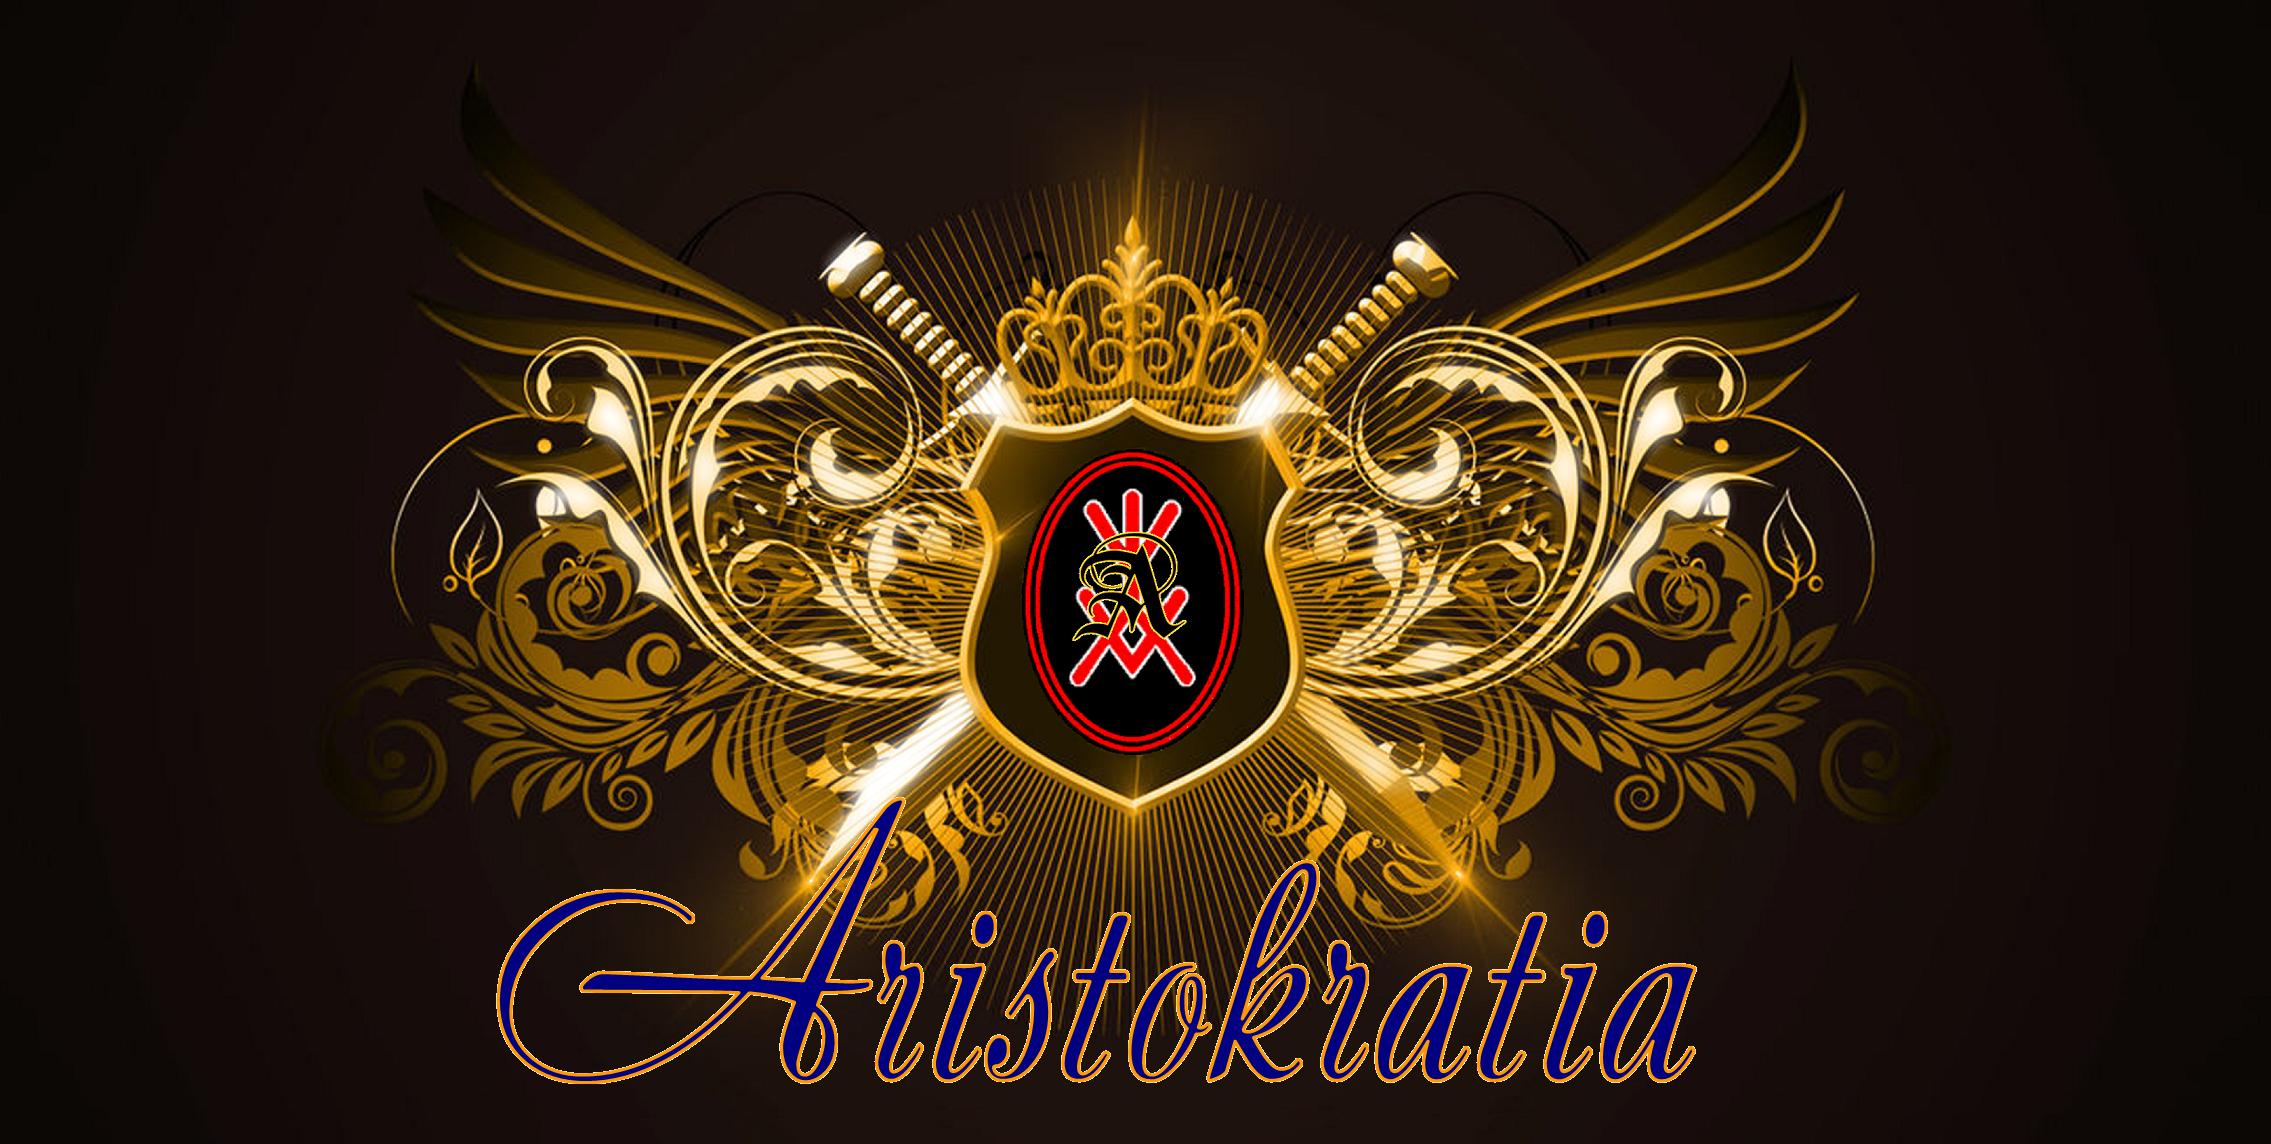 Aristokratia